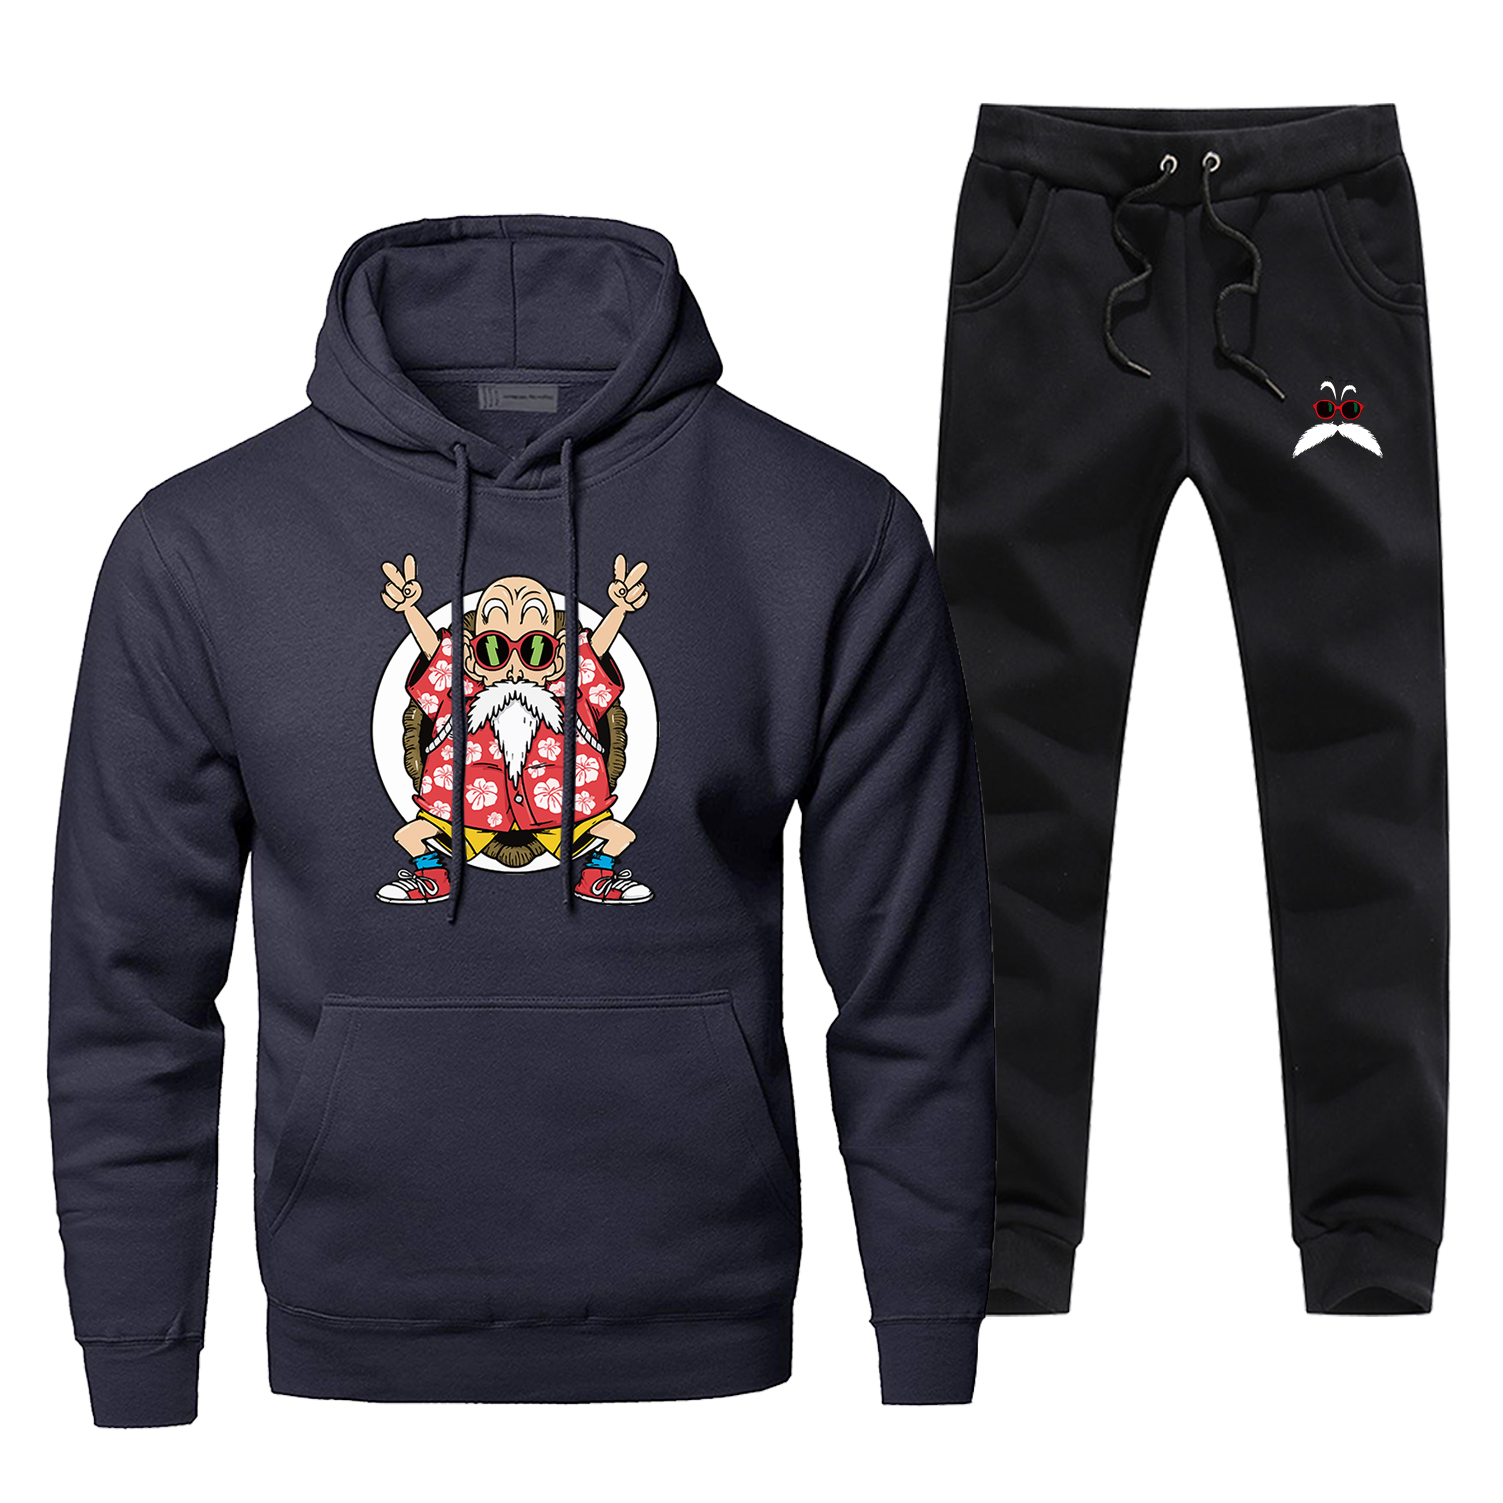 Fashion Dragon Ball Master Roshi Hoodies Funny Mens Hoodie+Pants 2 Piece Sets Casual Tracksuit Male Fleece Sportswear Sweatpants